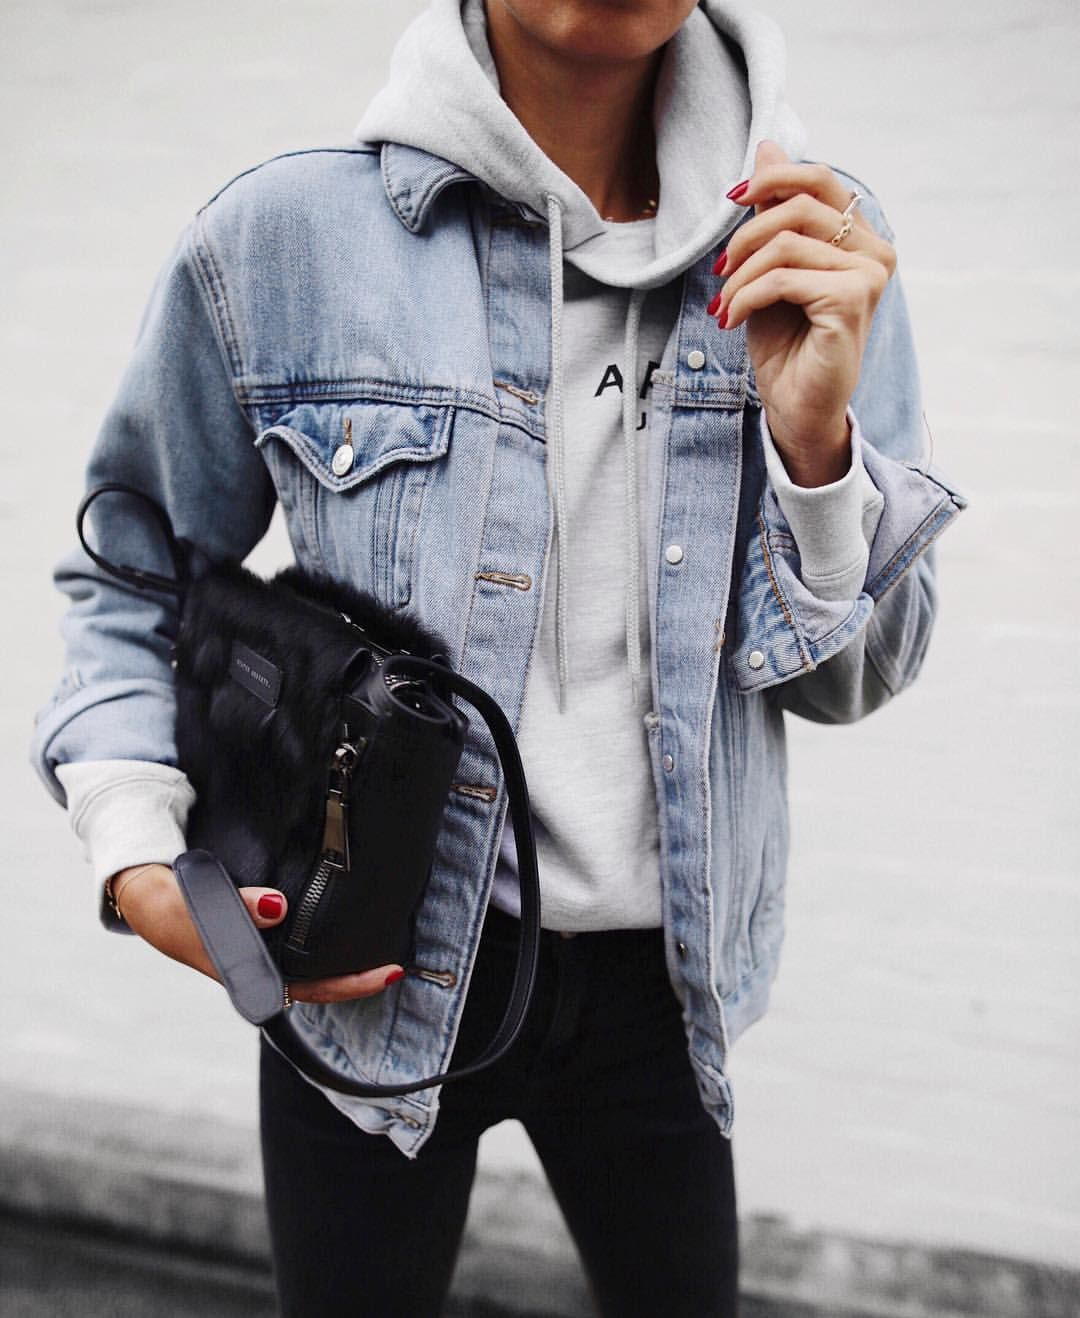 Oversized denim jacket x sweatshirt x black skinnies   style file   Pinterest   Oversized denim ...